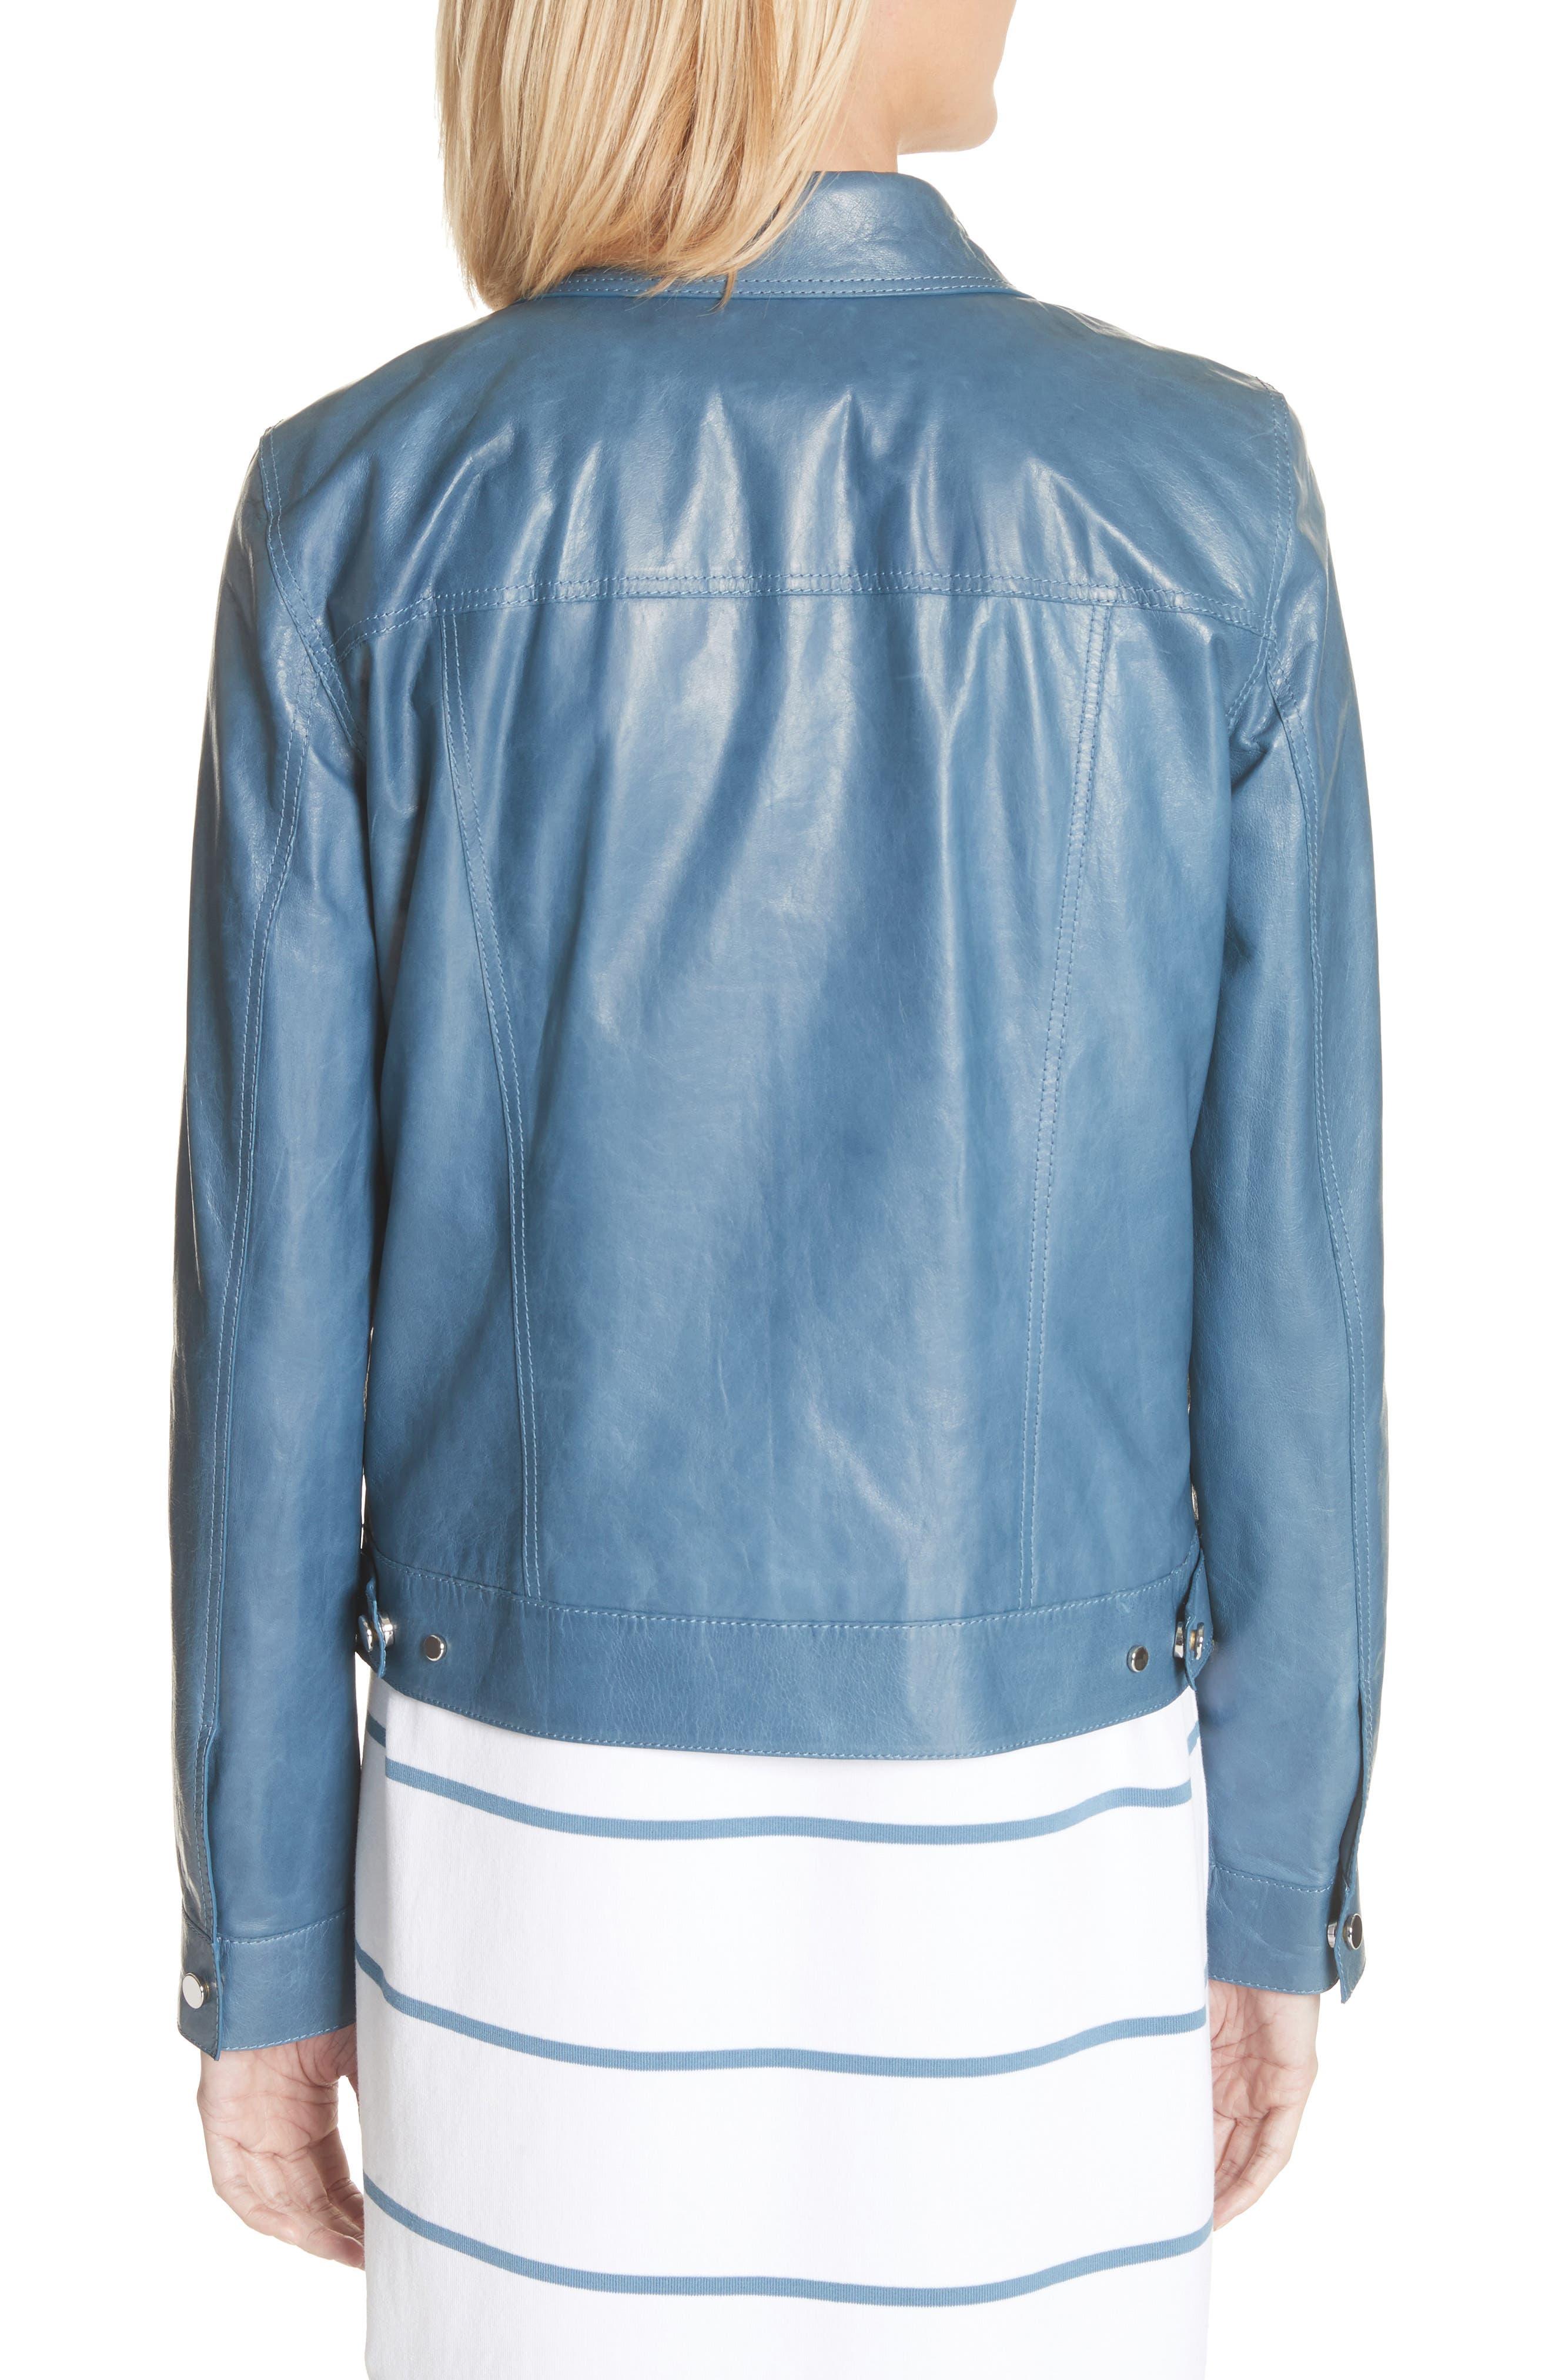 Destiny Leather Jacket,                             Alternate thumbnail 2, color,                             Placid Blue